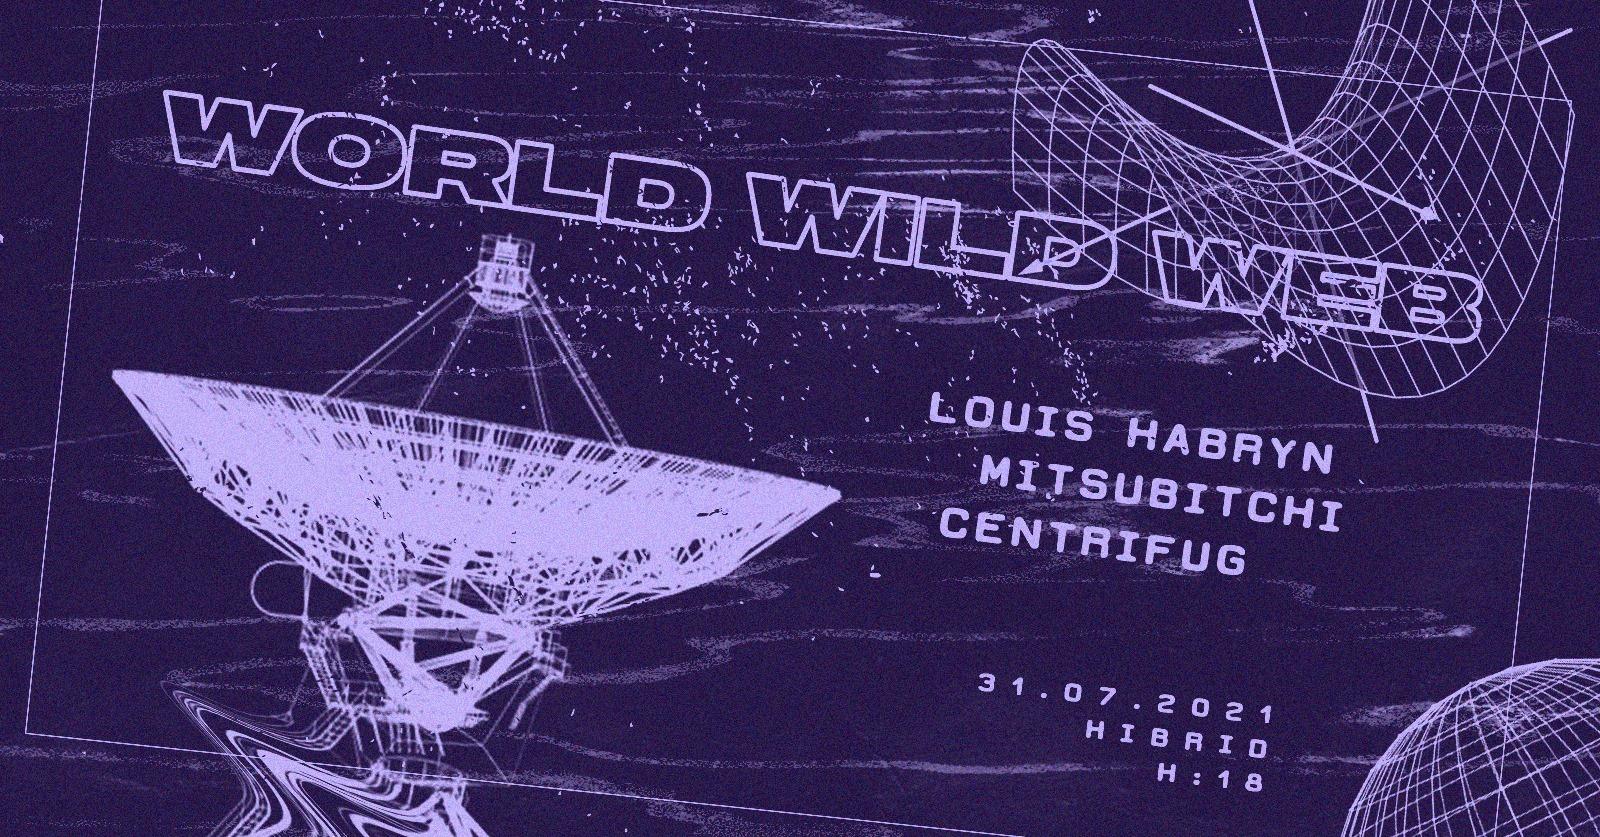 World Wild Web pres. Louis Habryn, Mitsubitchi & Centrifug